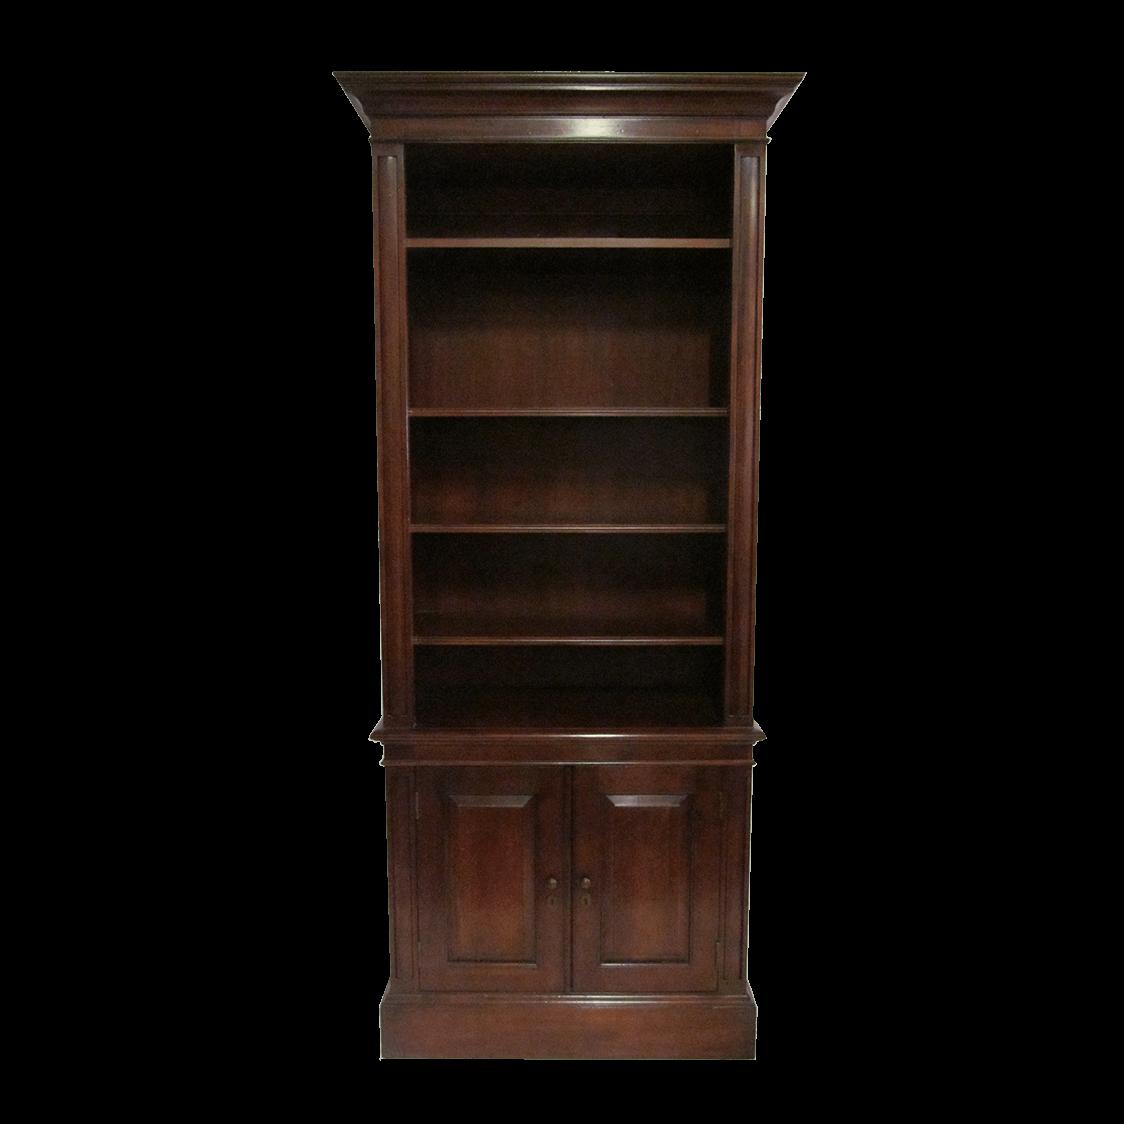 253842_Baker_Petitie_Bookcase